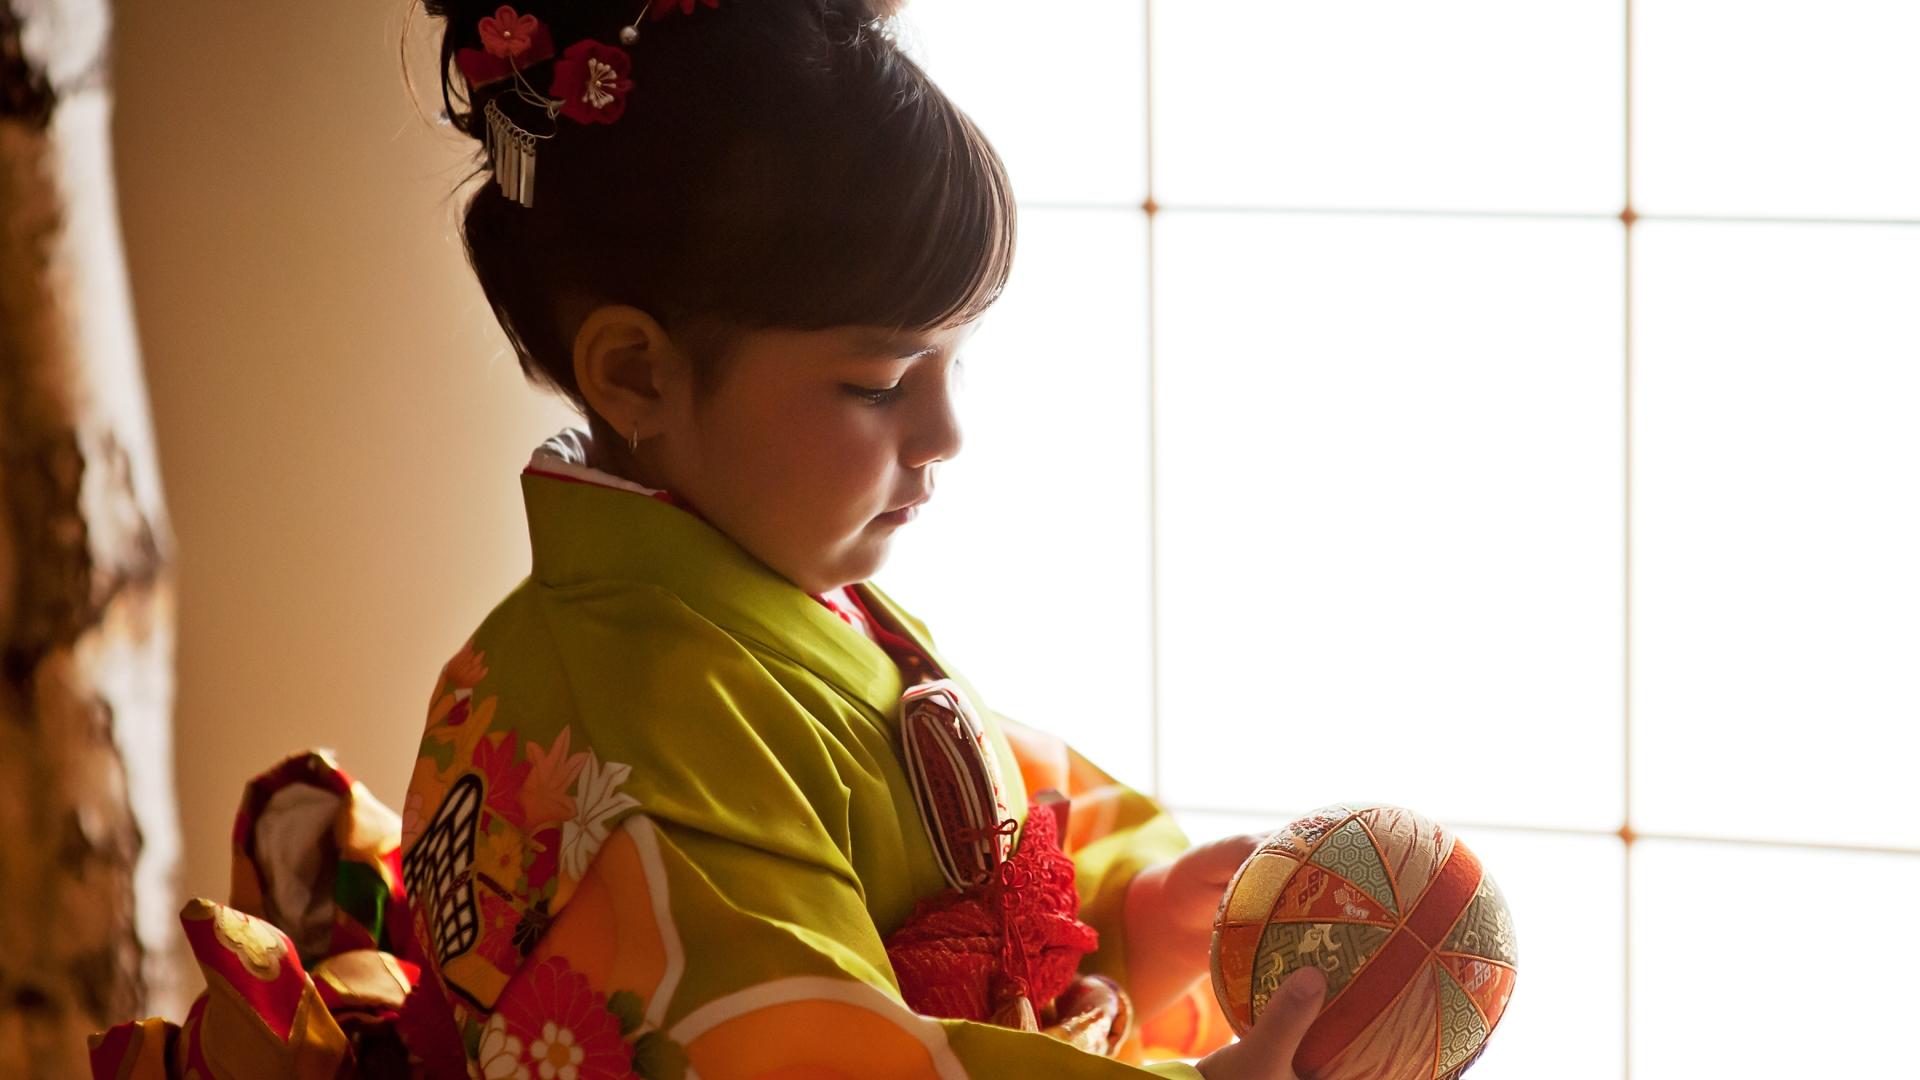 A girl in kimono, Celebrating Shichi Go San, Kimono Photography utilizing natural lighting, Shichi Go San in Los Angeles, Sisters in kimonos,